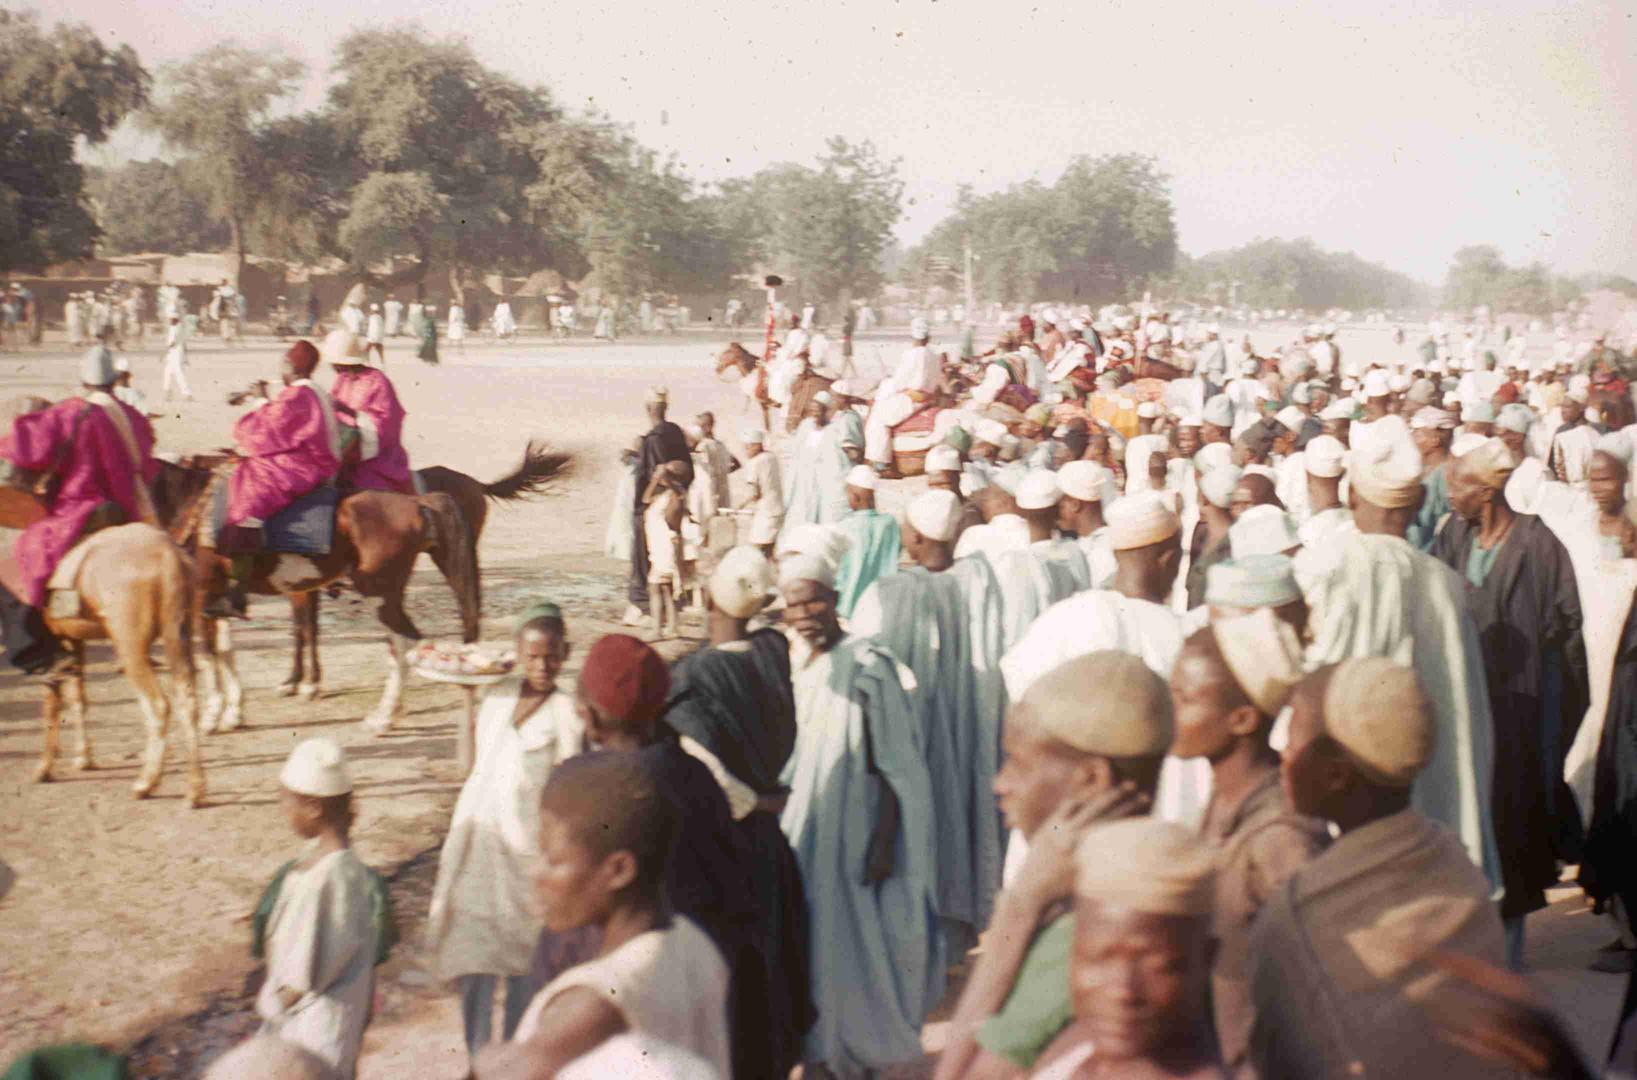 1959_1960_Africa_02726.jpg